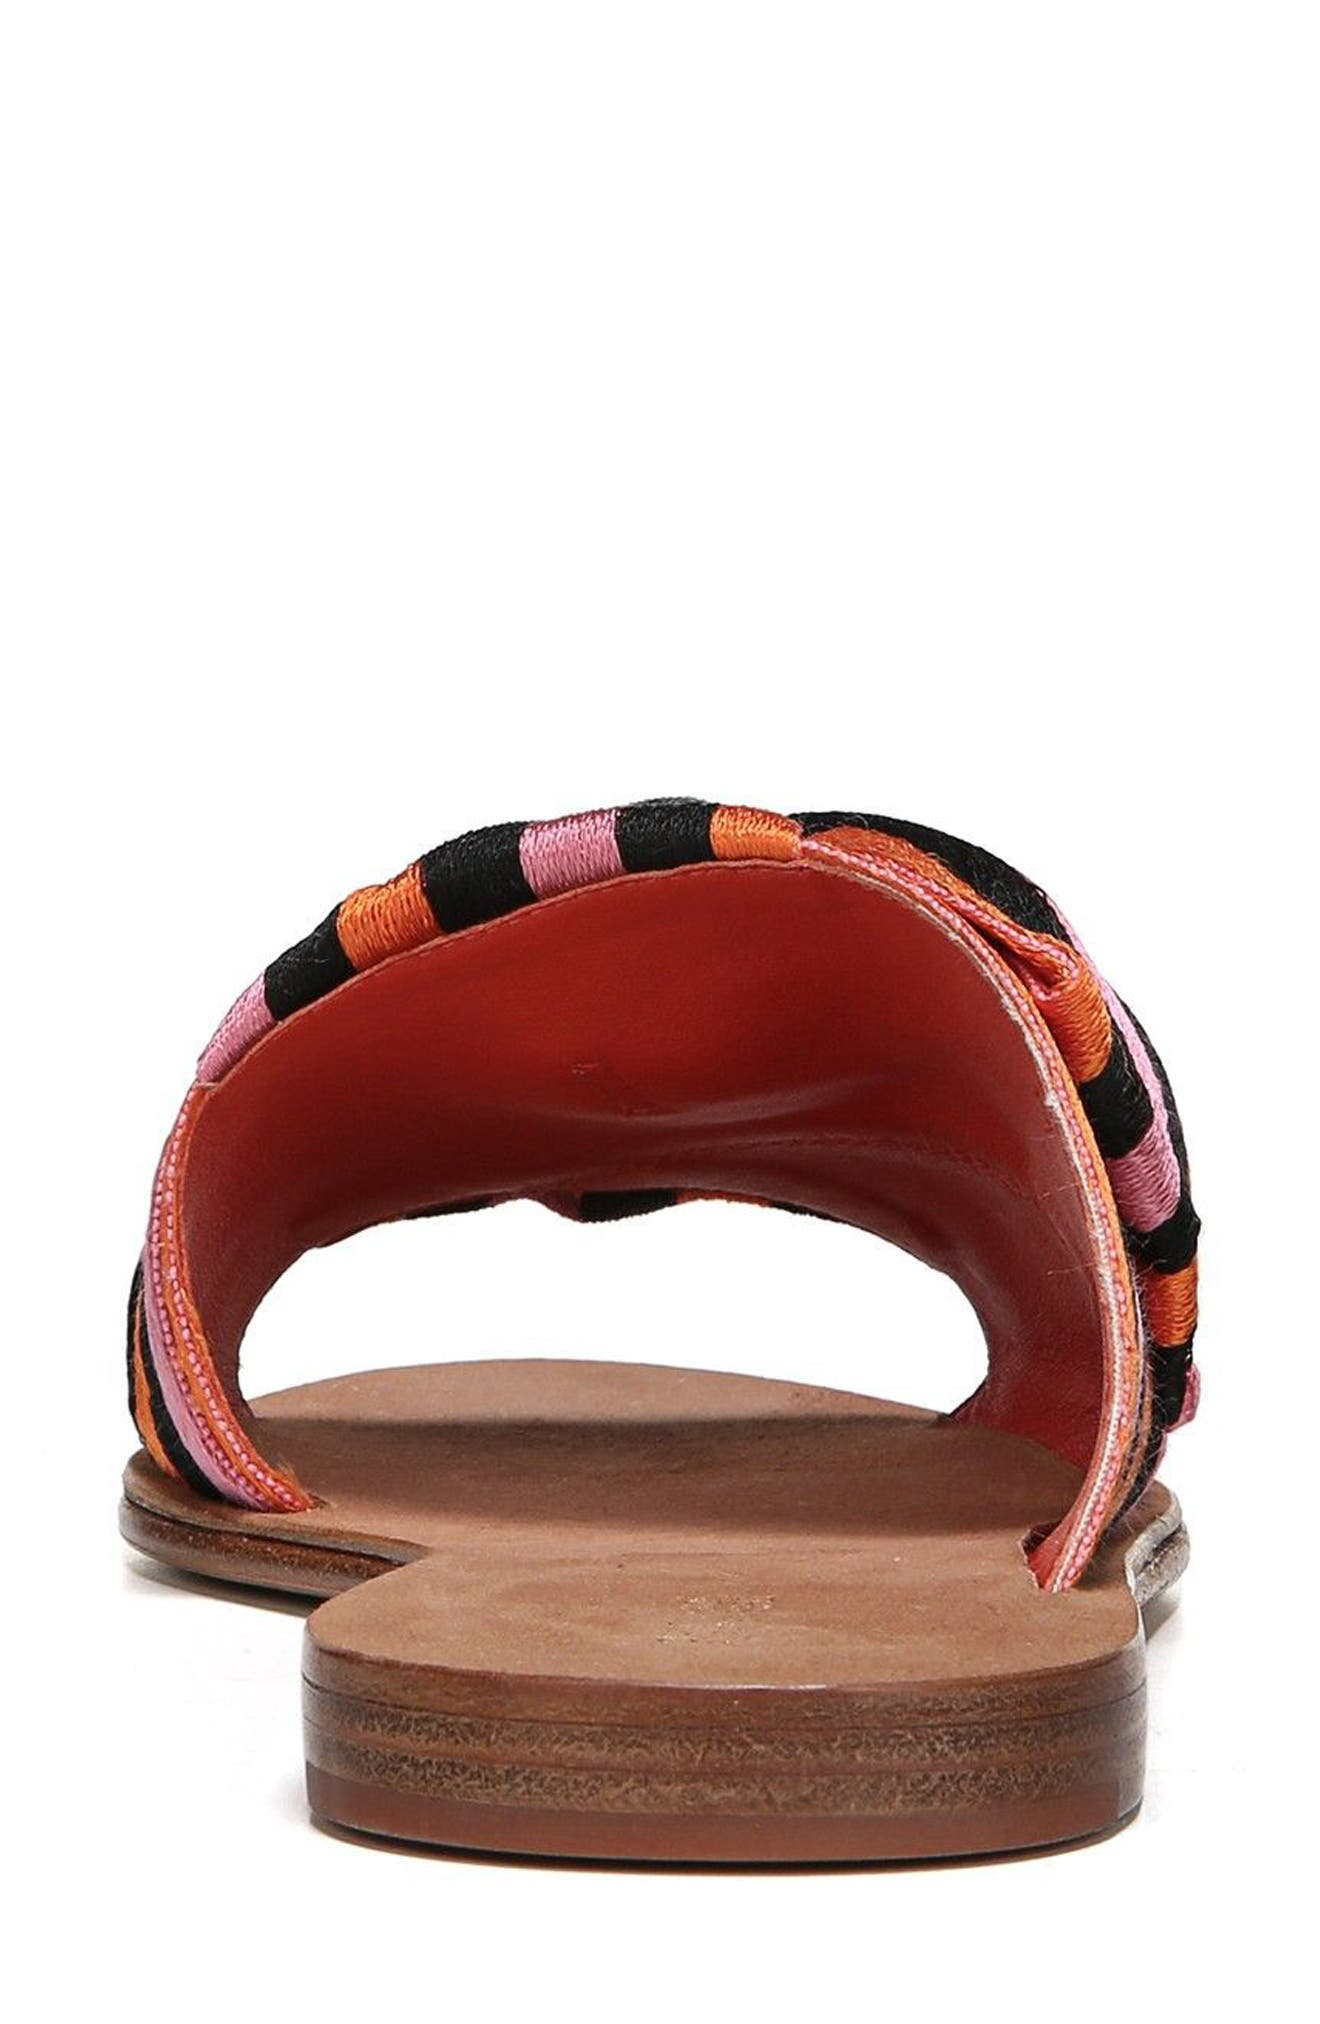 Bella Asymmetrical Slide Sandal,                             Alternate thumbnail 14, color,